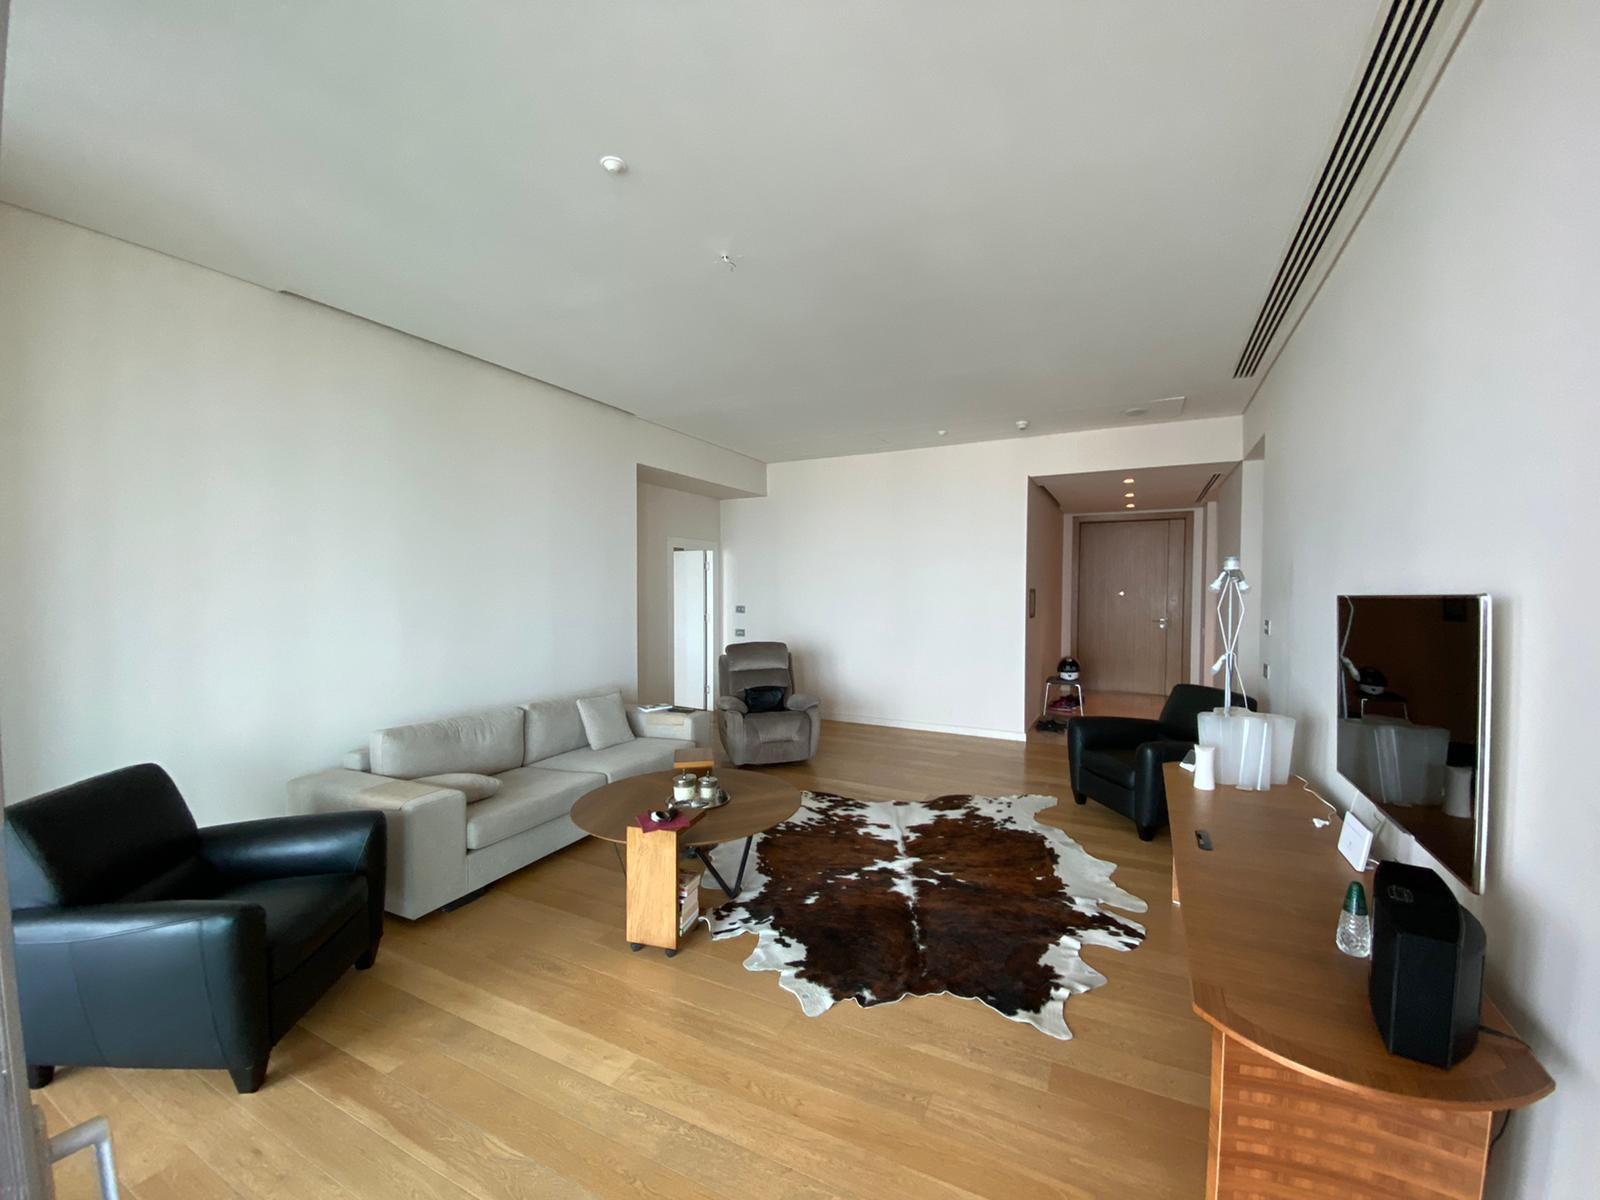 penthouse-istanbul-sapphire-tower-42th-floor-010.jpg